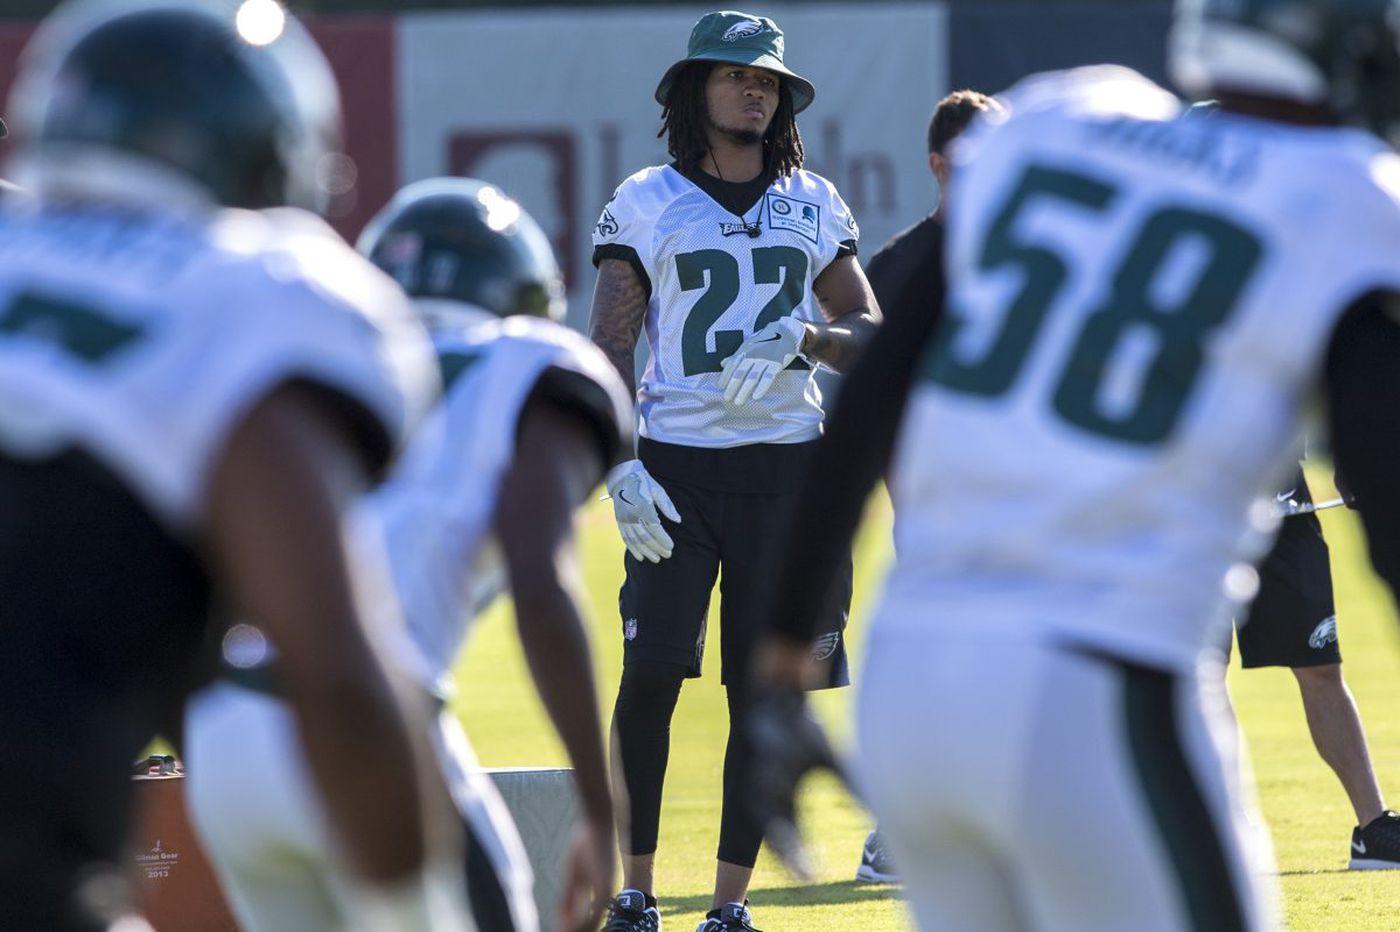 Eagles' Sidney Jones still not practicing; Doug Pederson says no timeline yet for return